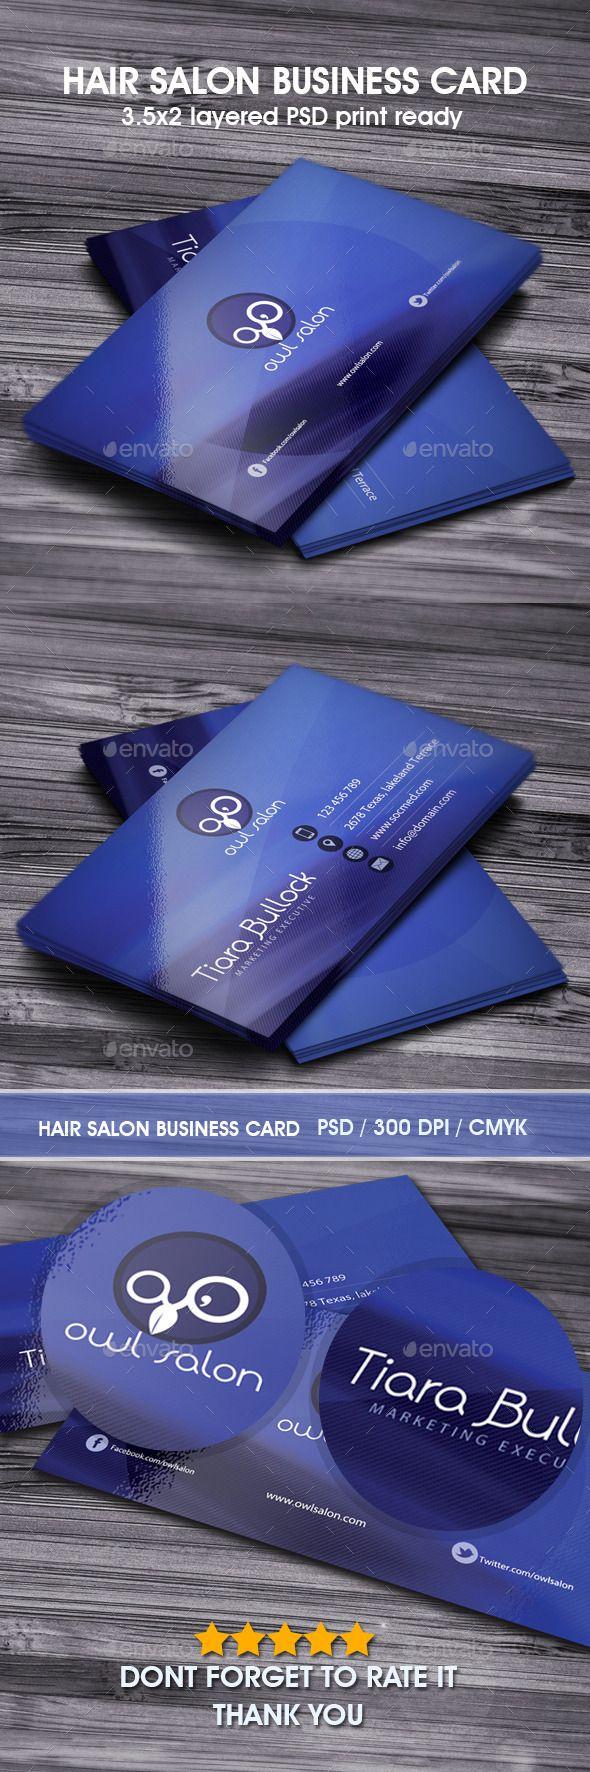 hair salon business card | download: http://graphicriver.net/item/hair-salon-business-card/9864007?s_phrase=&s_rank=3